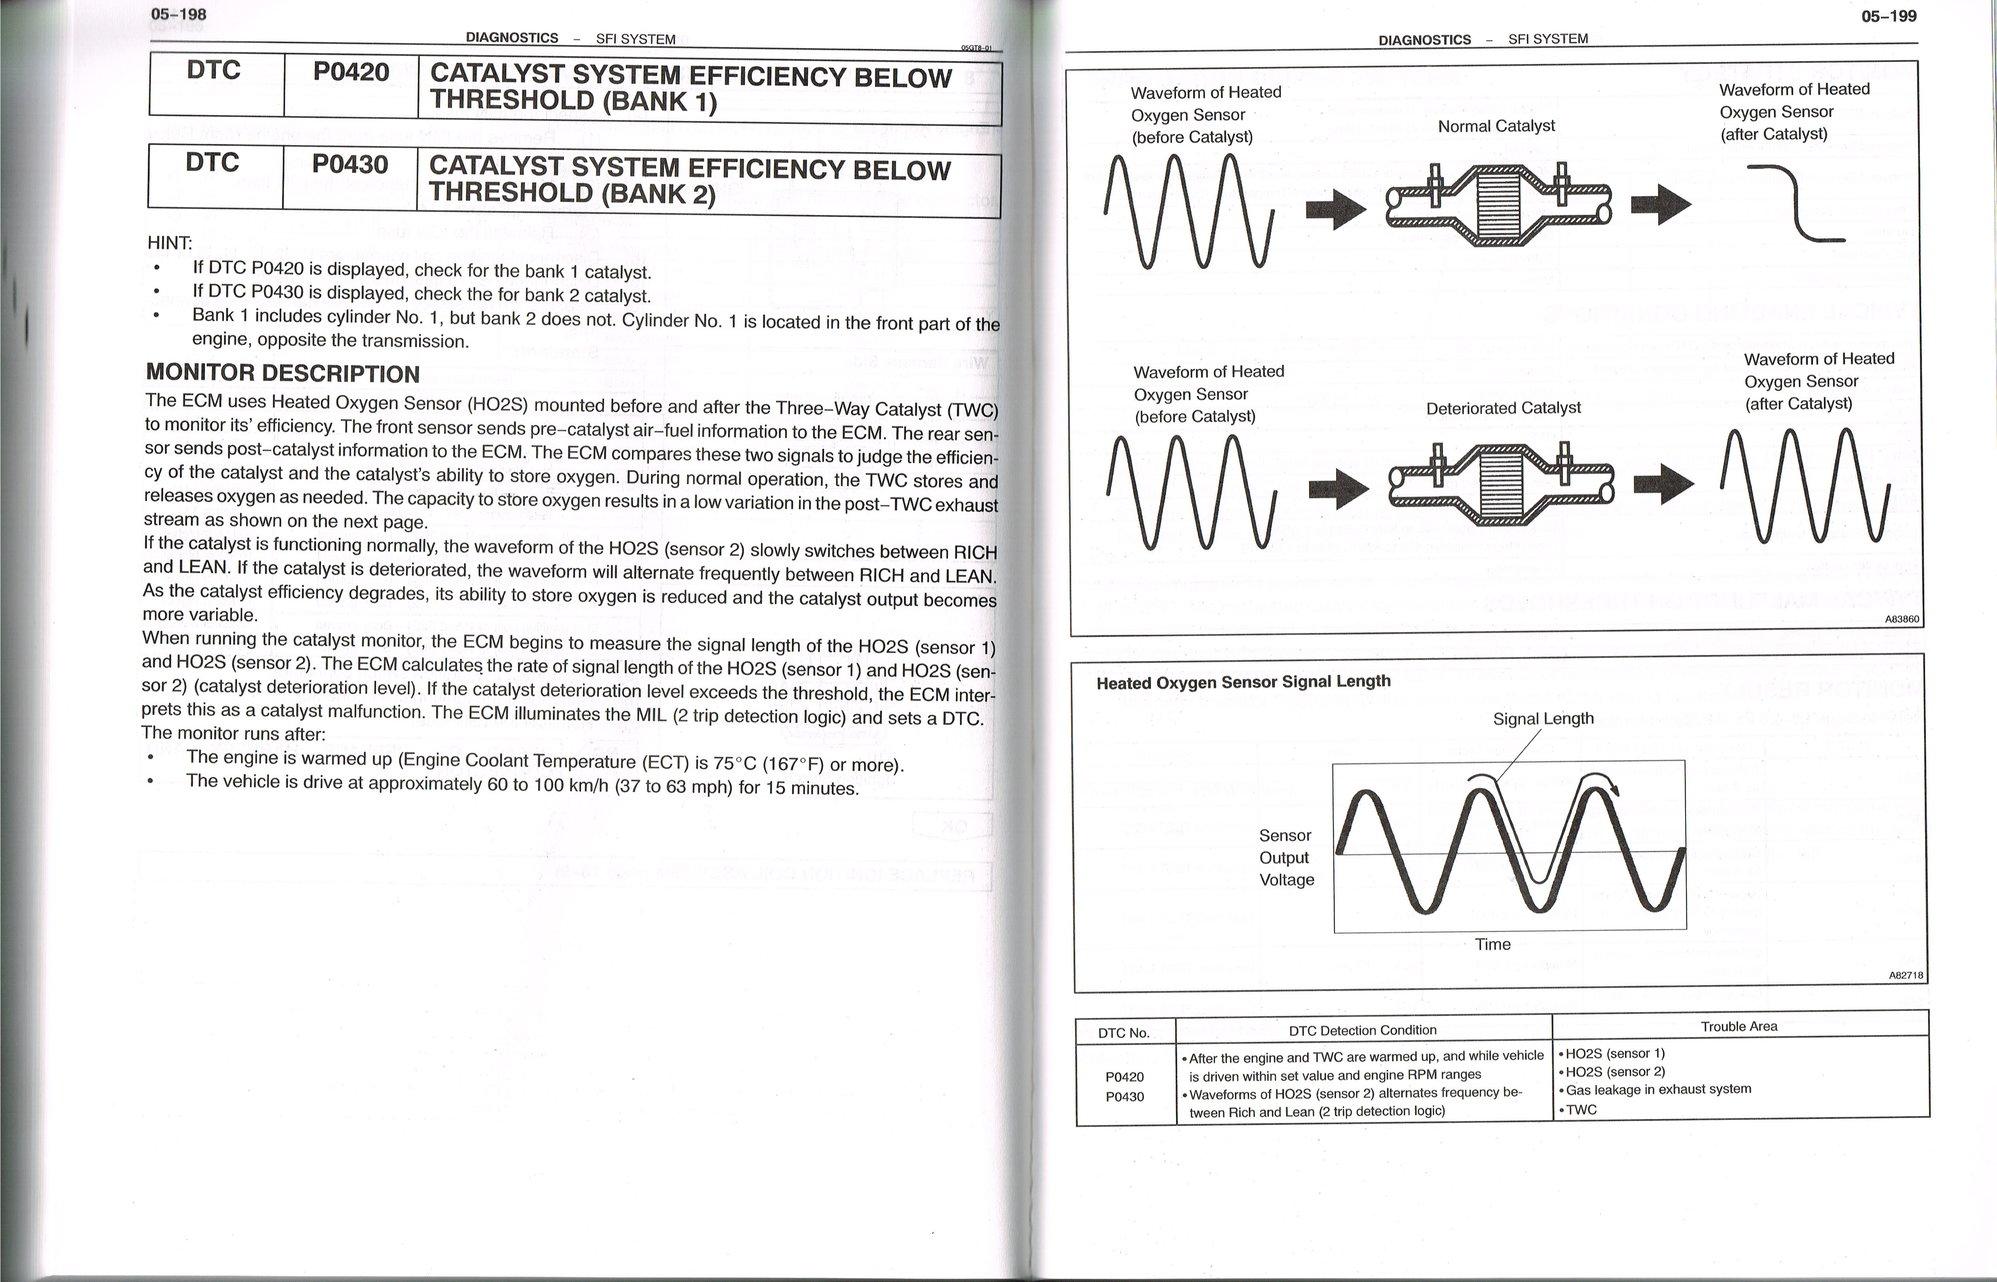 2003 ls430 - p0430 cel - ClubLexus - Lexus Forum Discussion